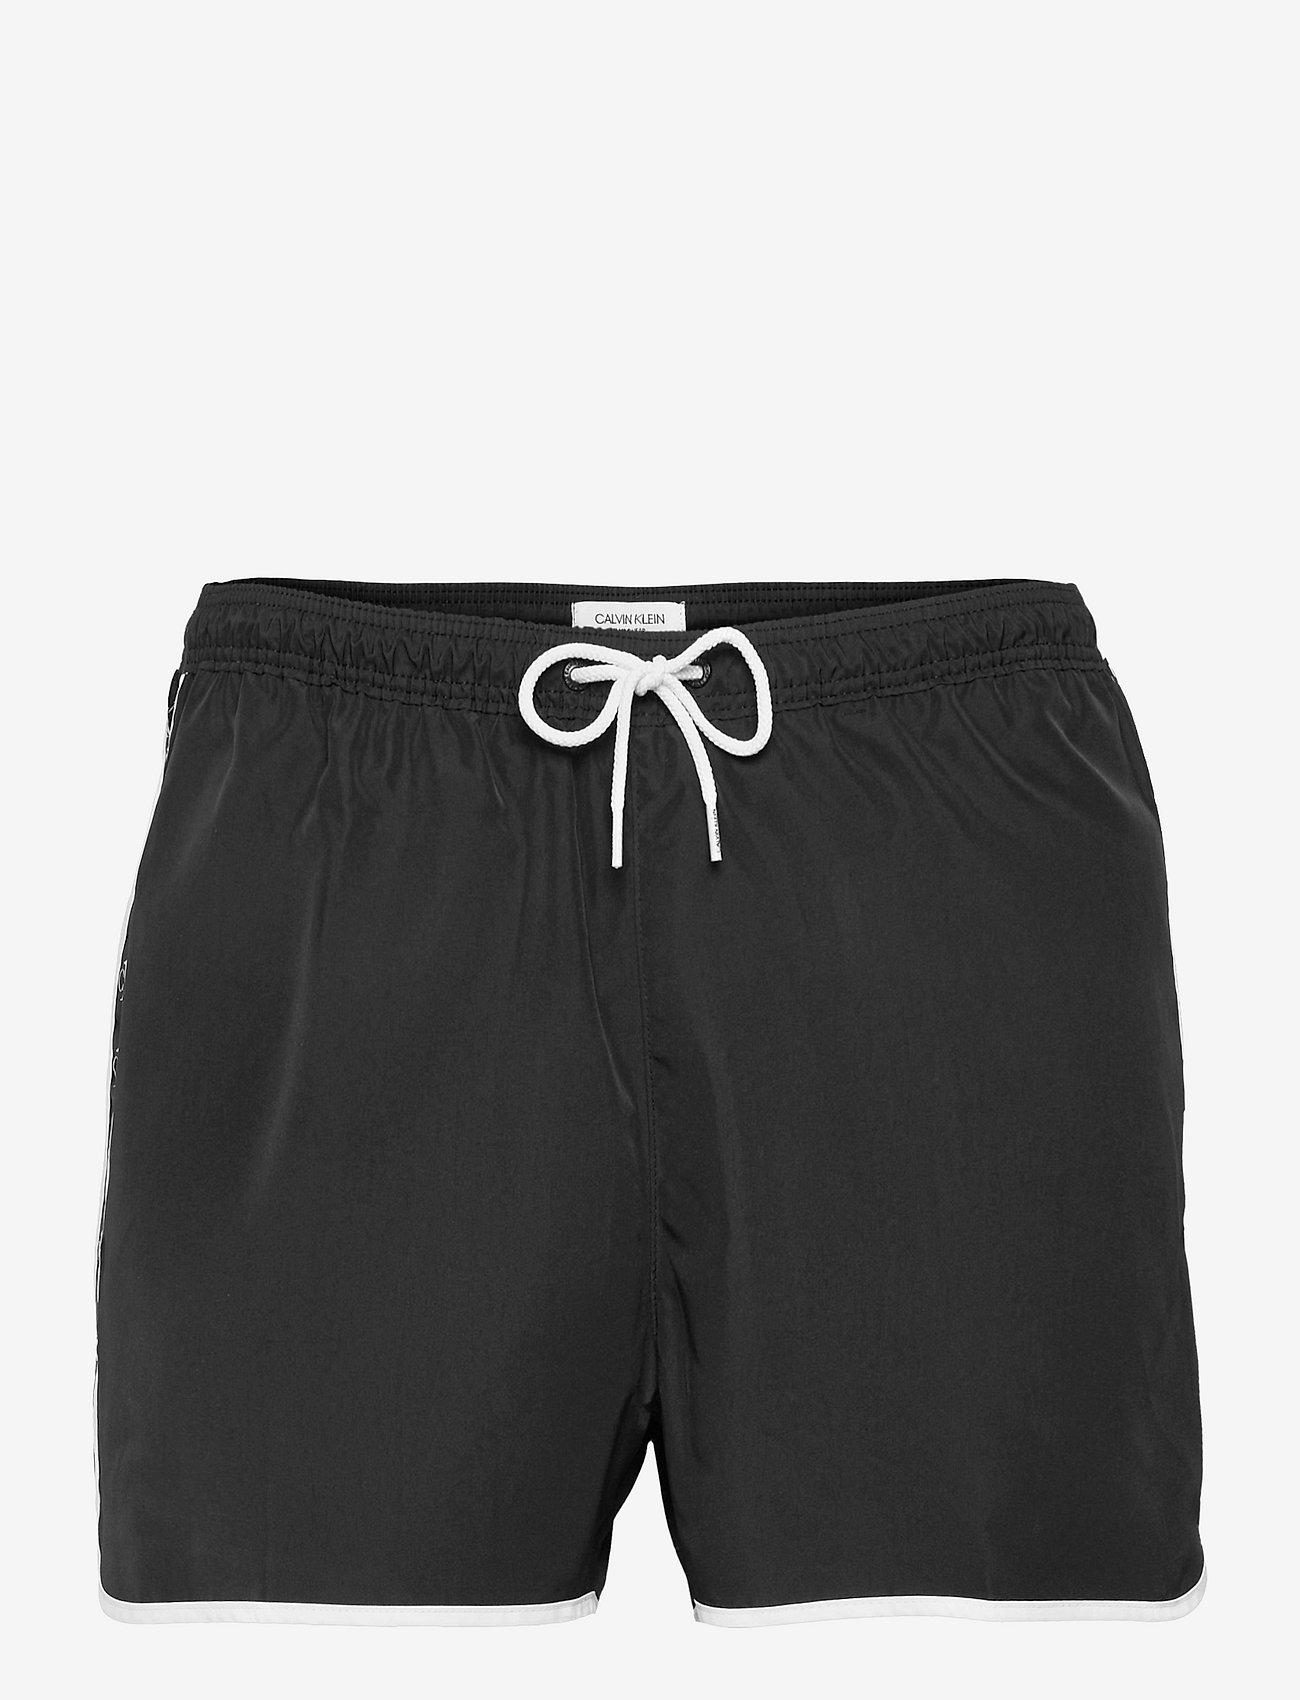 Calvin Klein - SHORT RUNNER - shorts de bain - pvh black - 0